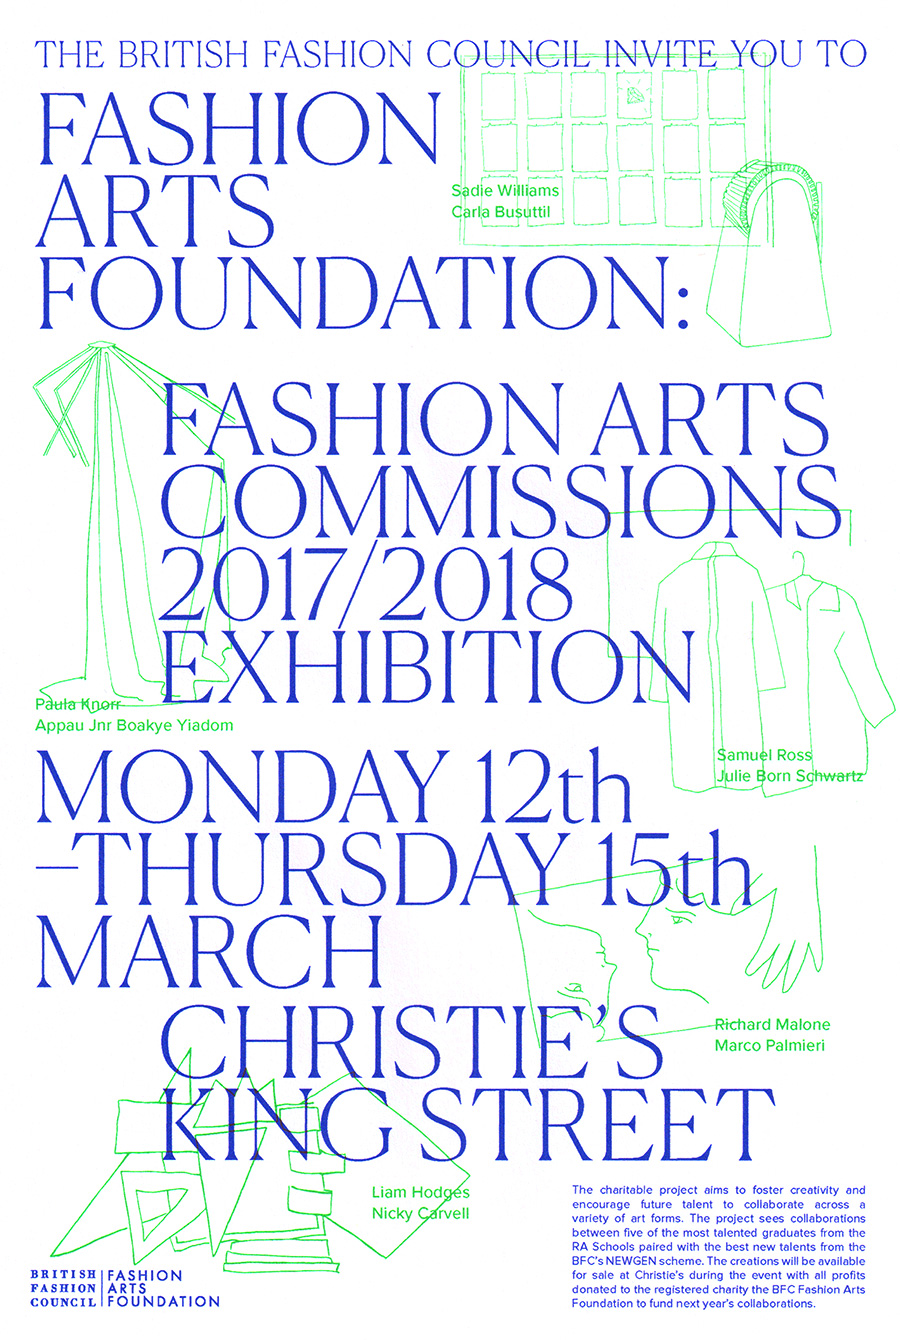 FAF-Invite-Exhibition.jpg